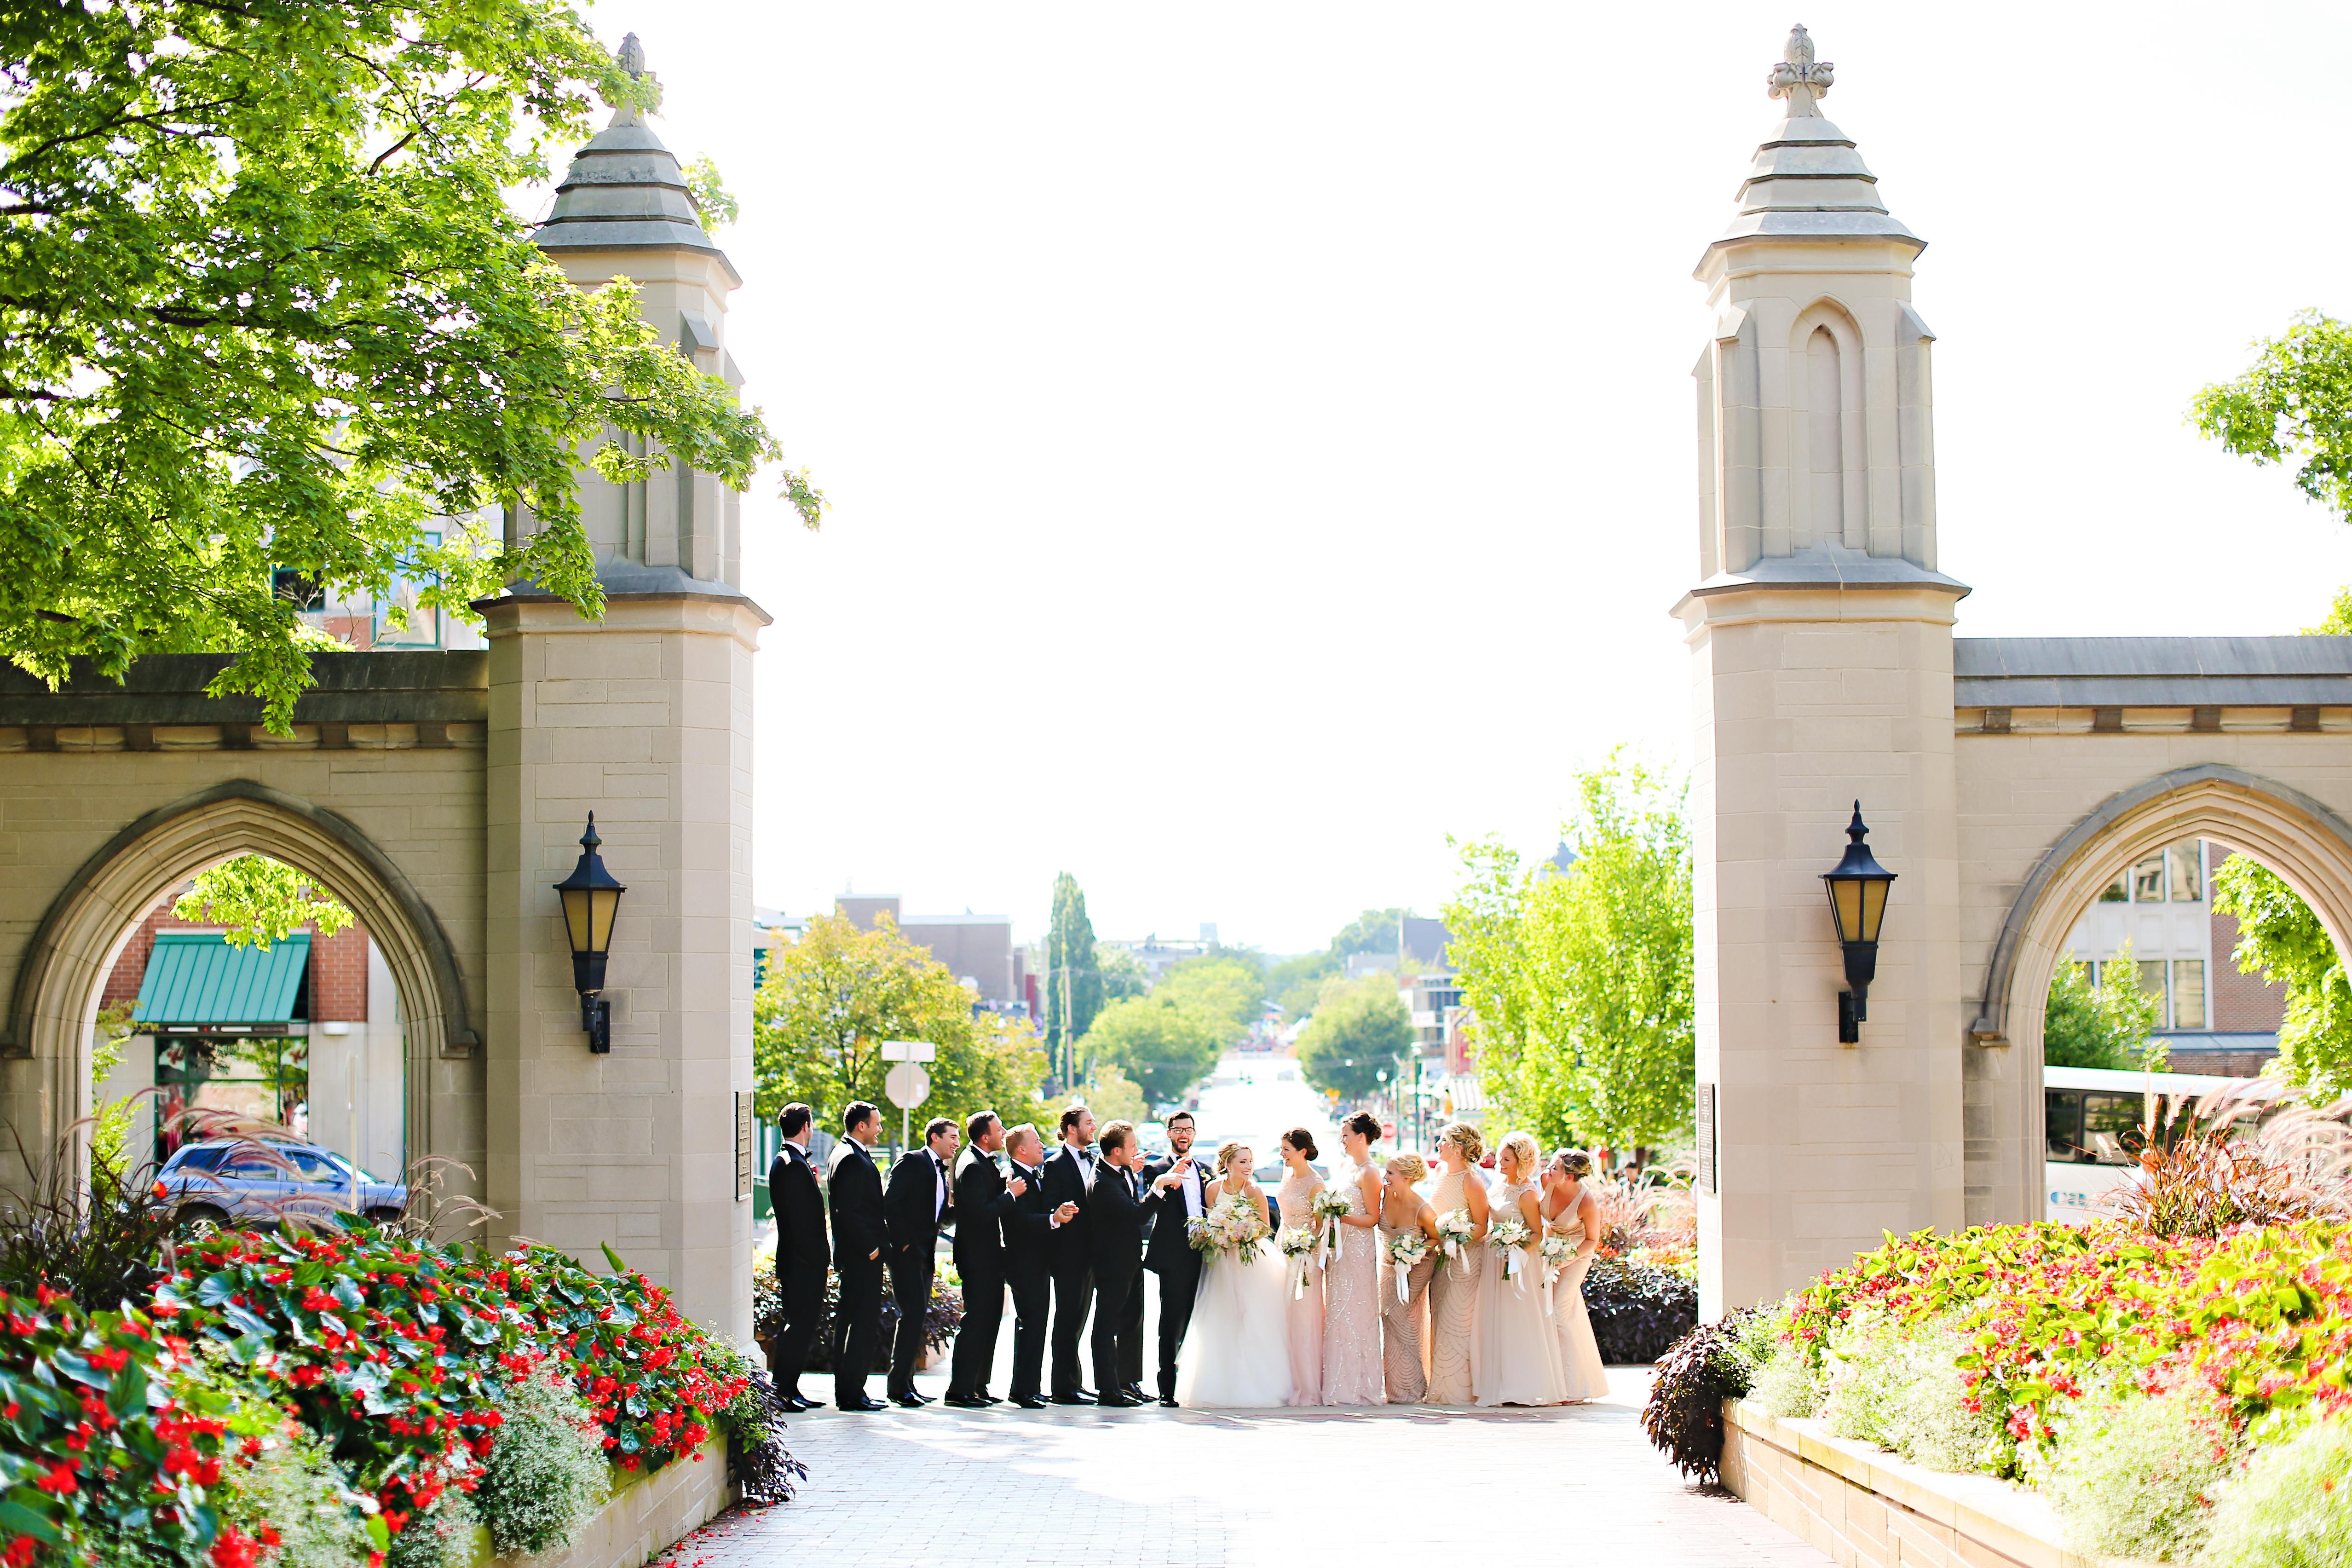 126 meaghan matt indiana university wedding